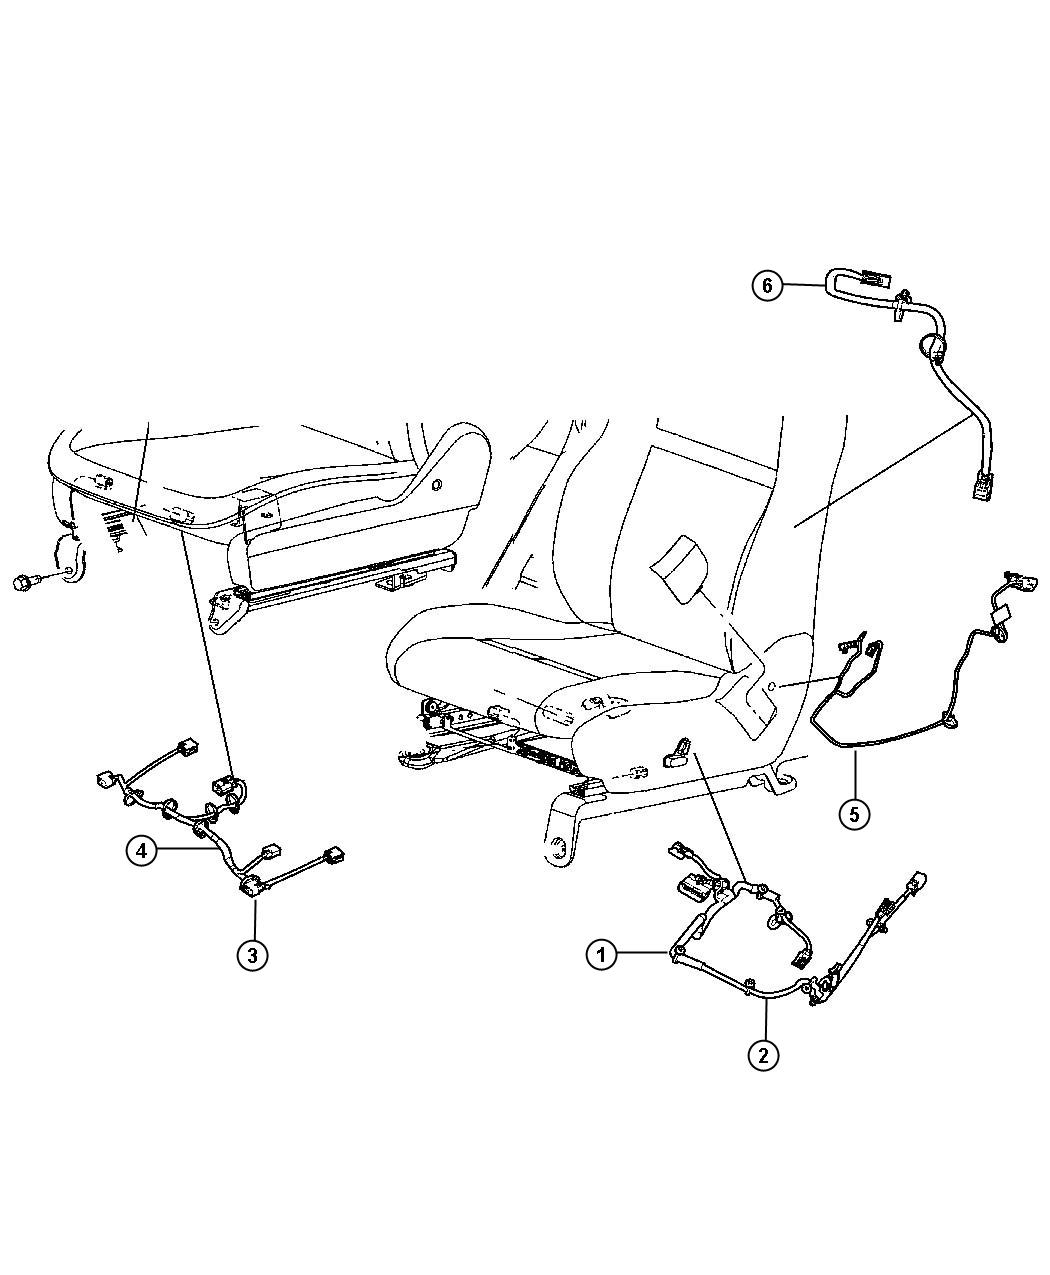 Dodge Grand Caravan Wiring. Power seat, seat. Trim: [lux